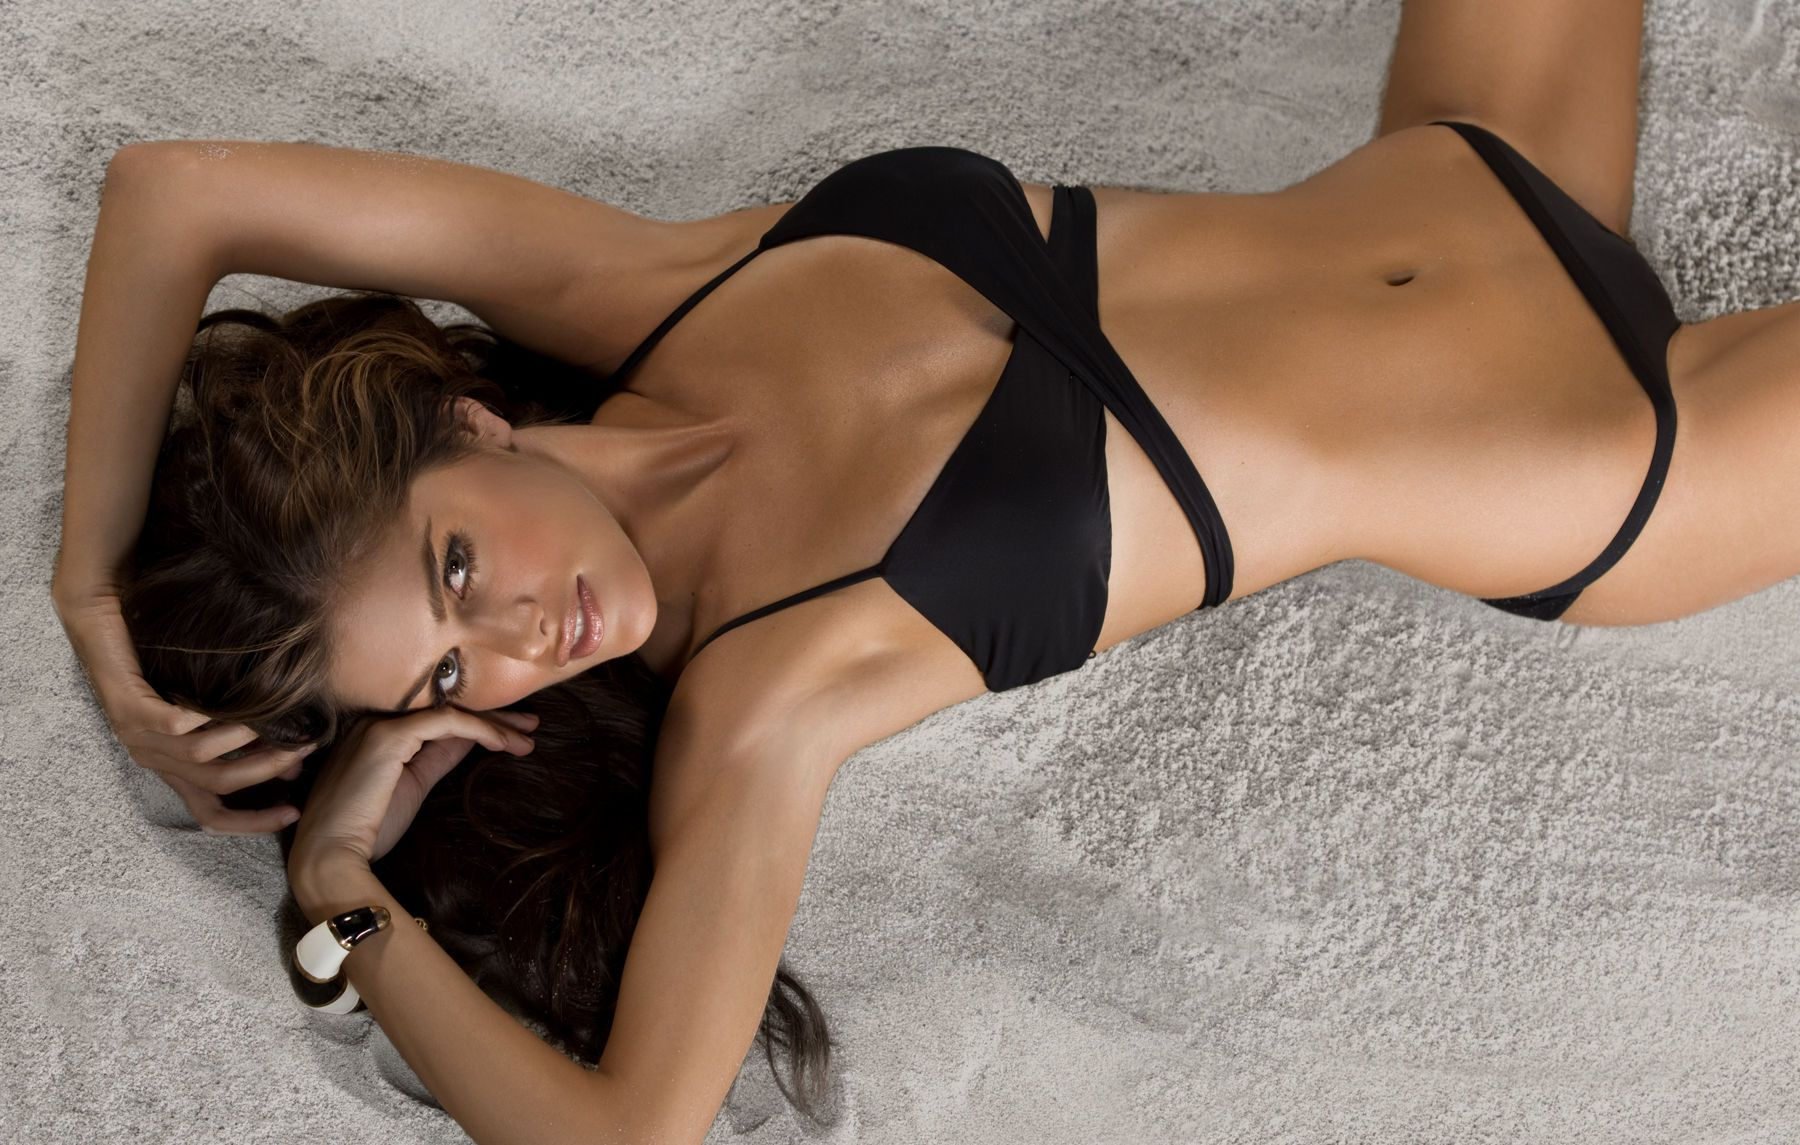 swimwear photographer nicolaas de bruin